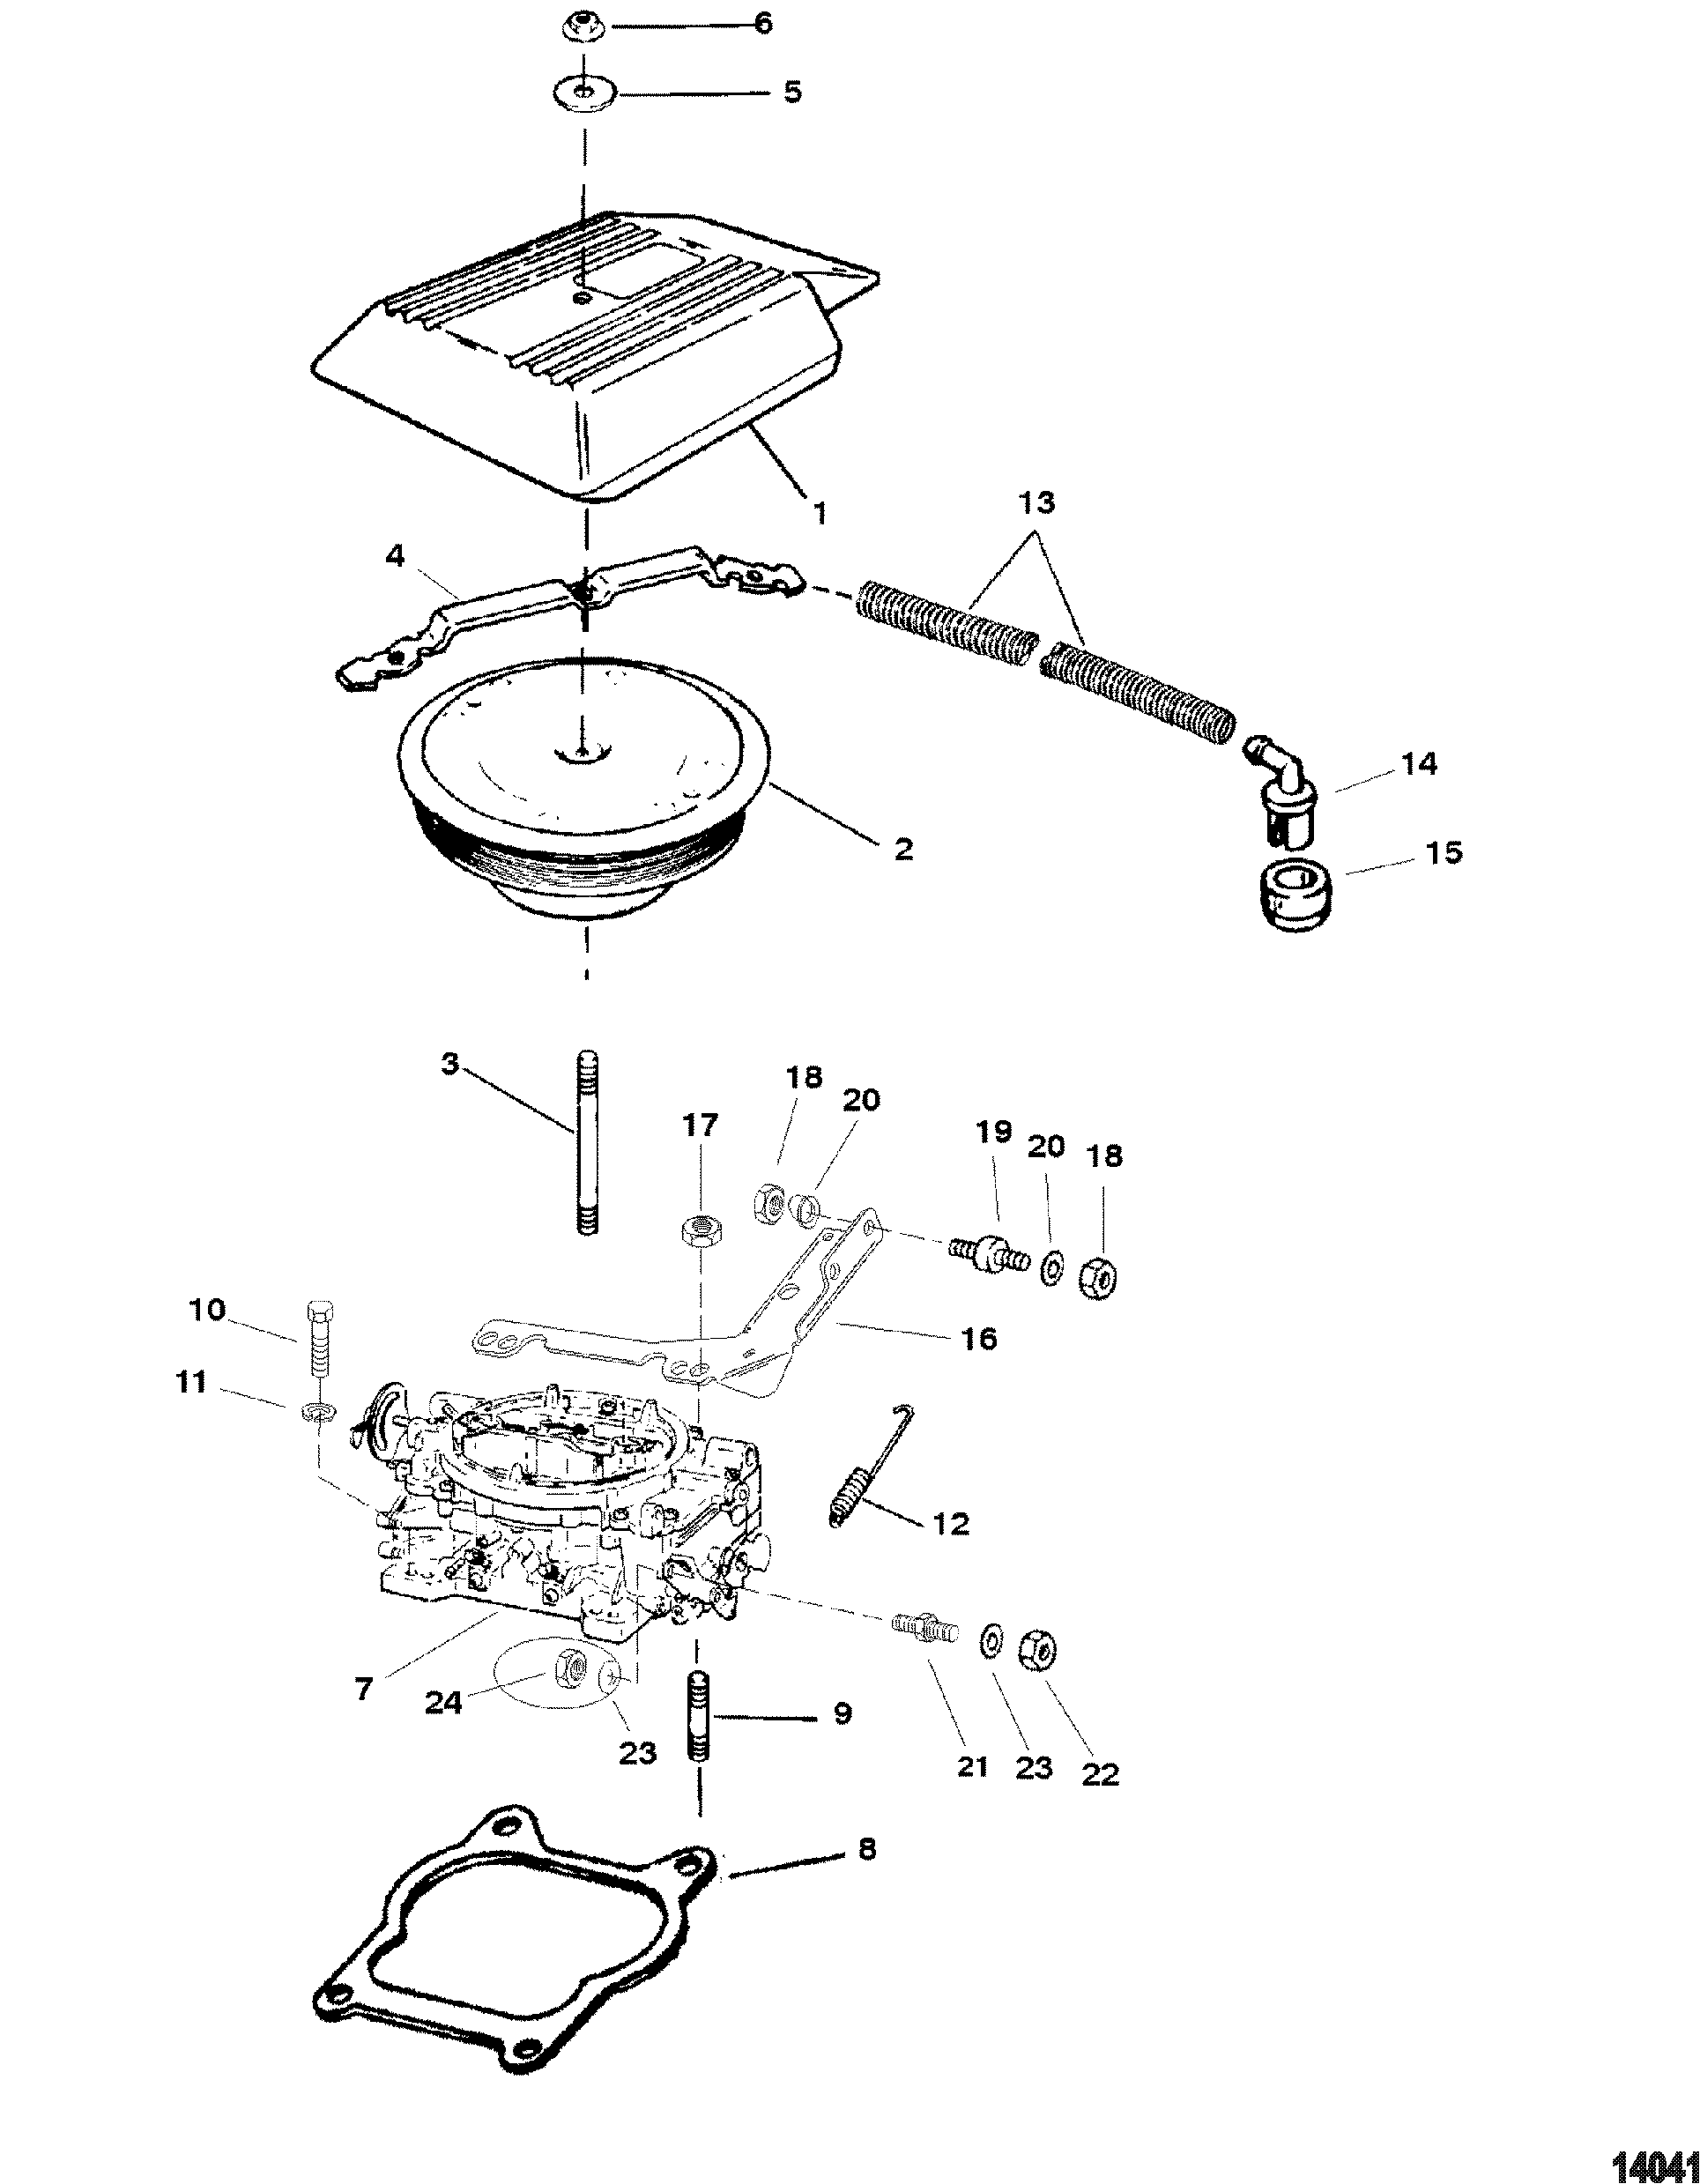 Carburetor And Throttle Linkage Four Barrel For Mercruiser 4 3l Alpha Bravo 262 Cid